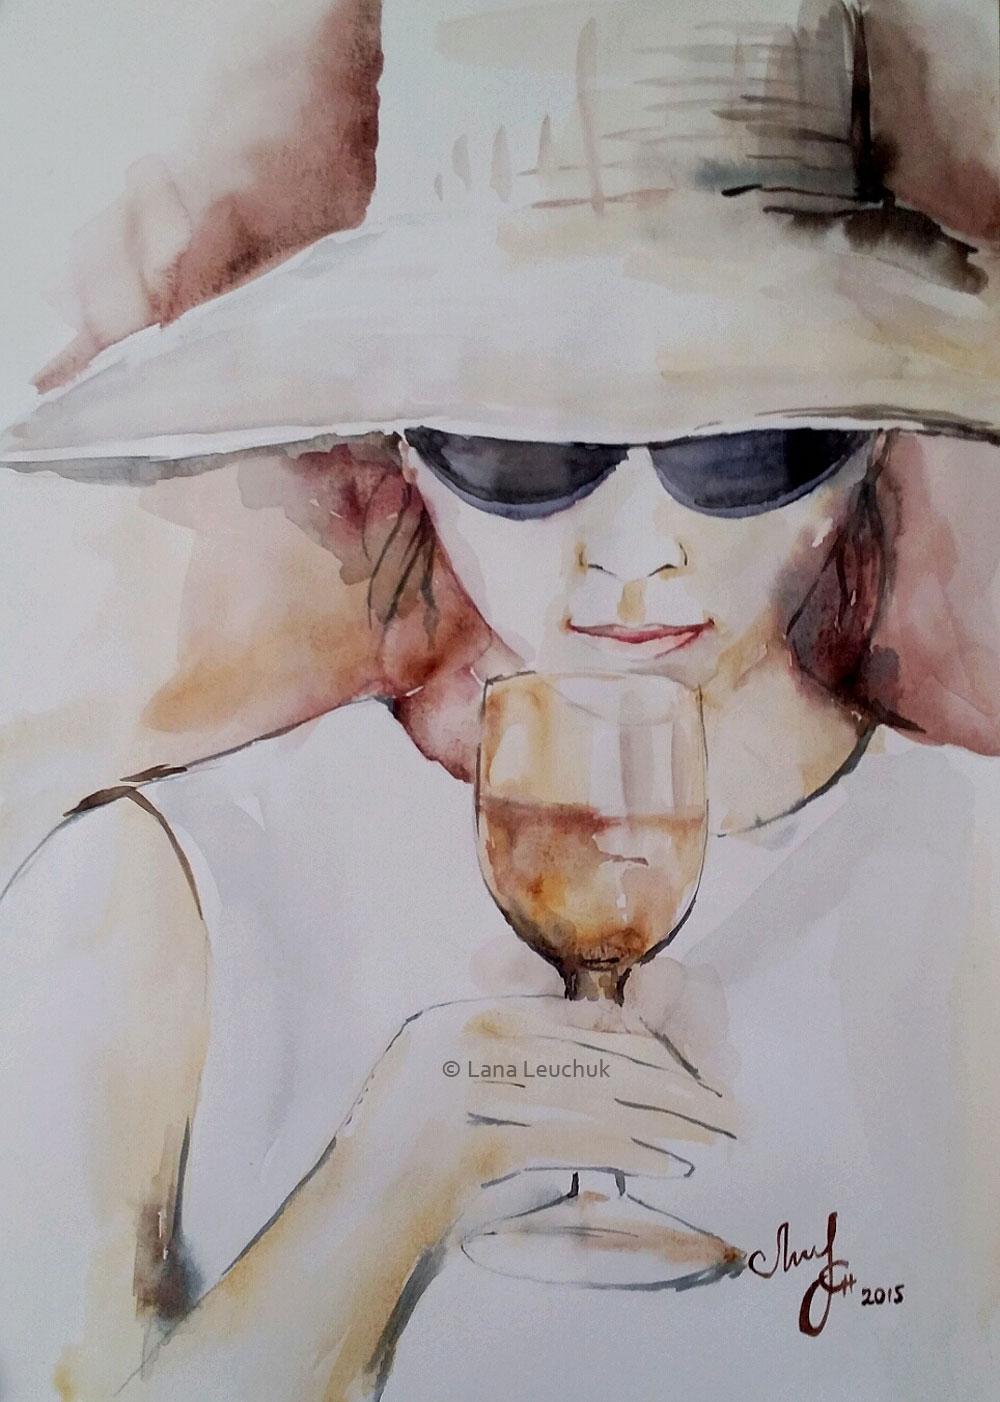 Luxurious-art-by-Lana-Leuchuk-Lanagraphic